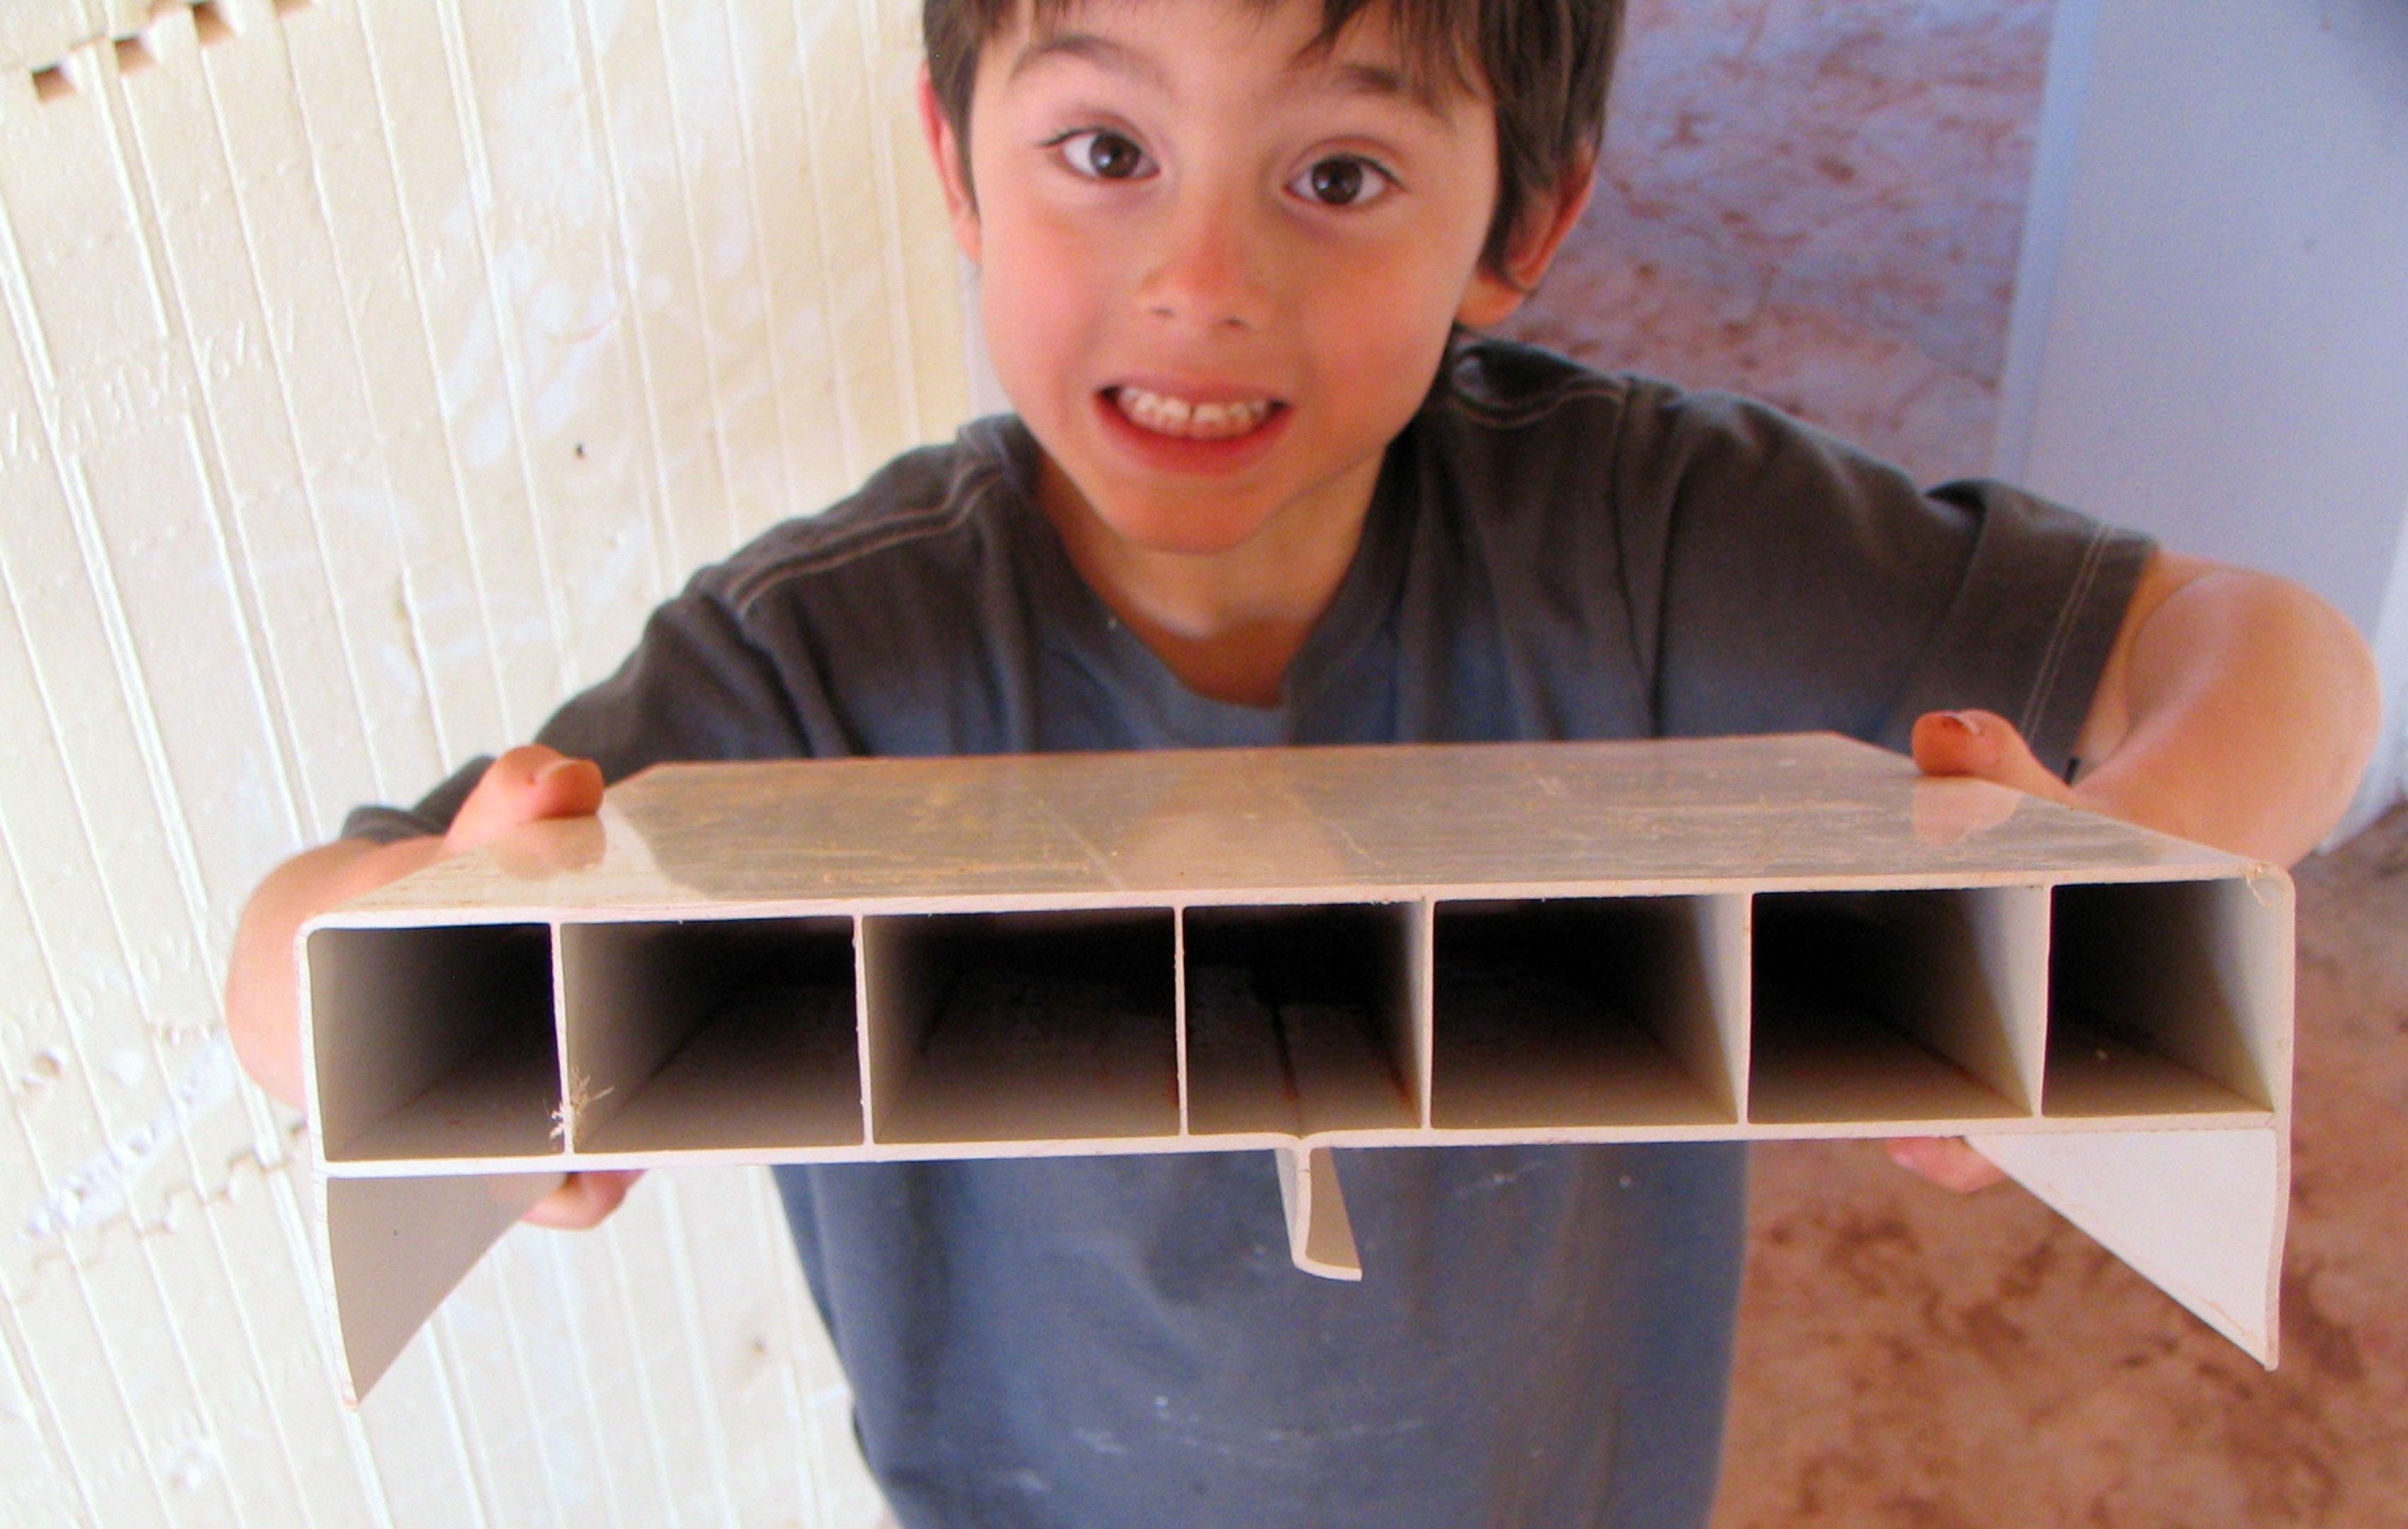 Vbuck for Buildblock pricing